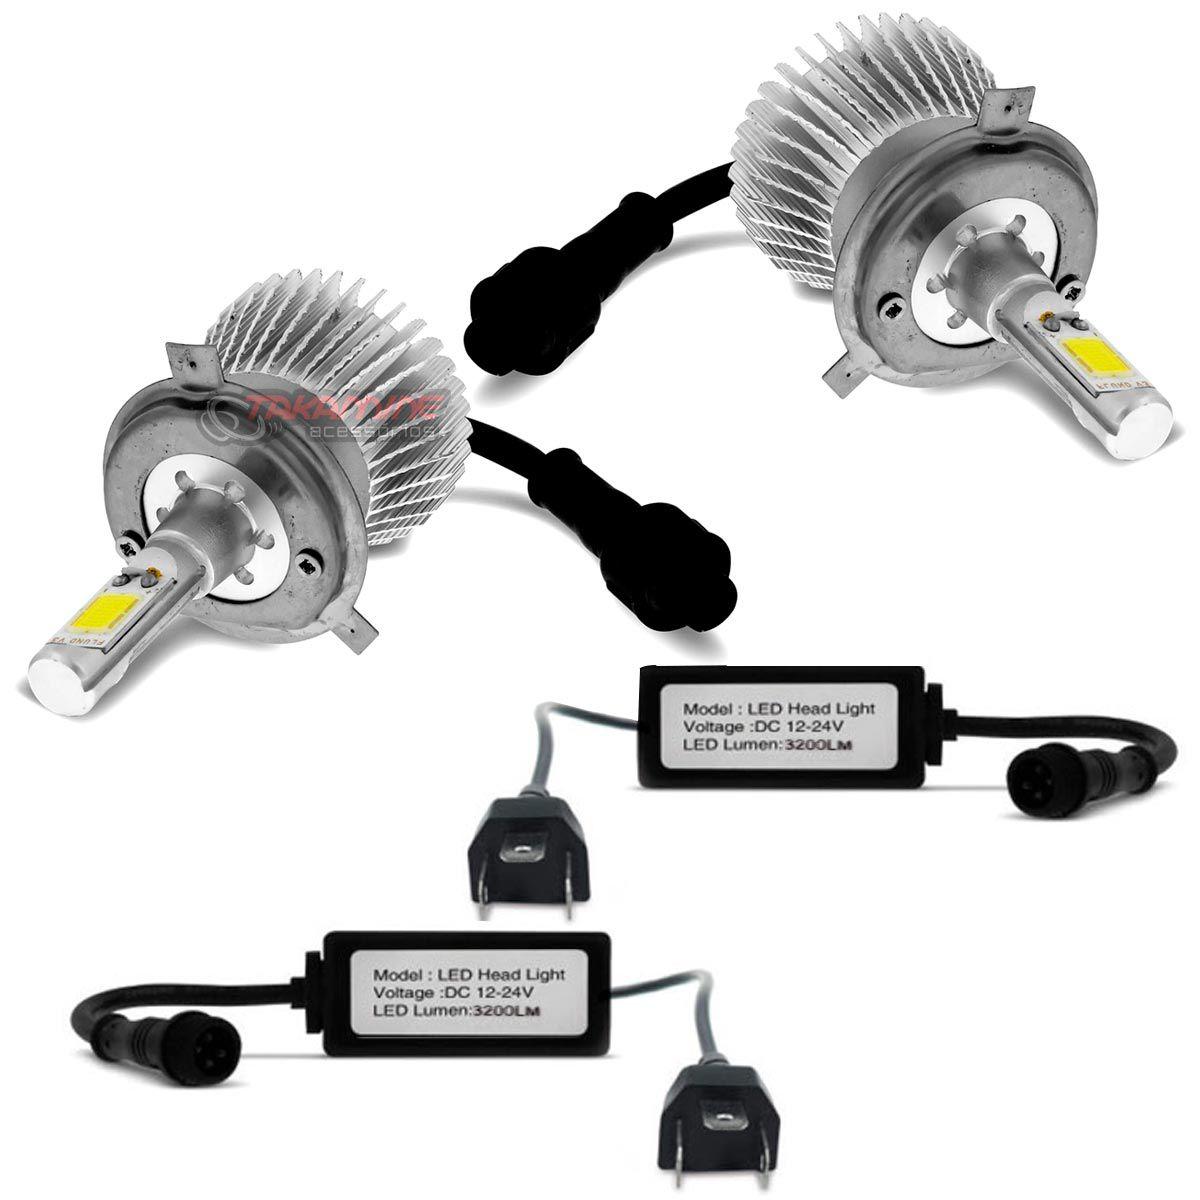 Kit LED Crossfox 2003 2004 2005 2006 2007 2008 2009 tipo xenon farol alto e baixo H4 35W Headlight